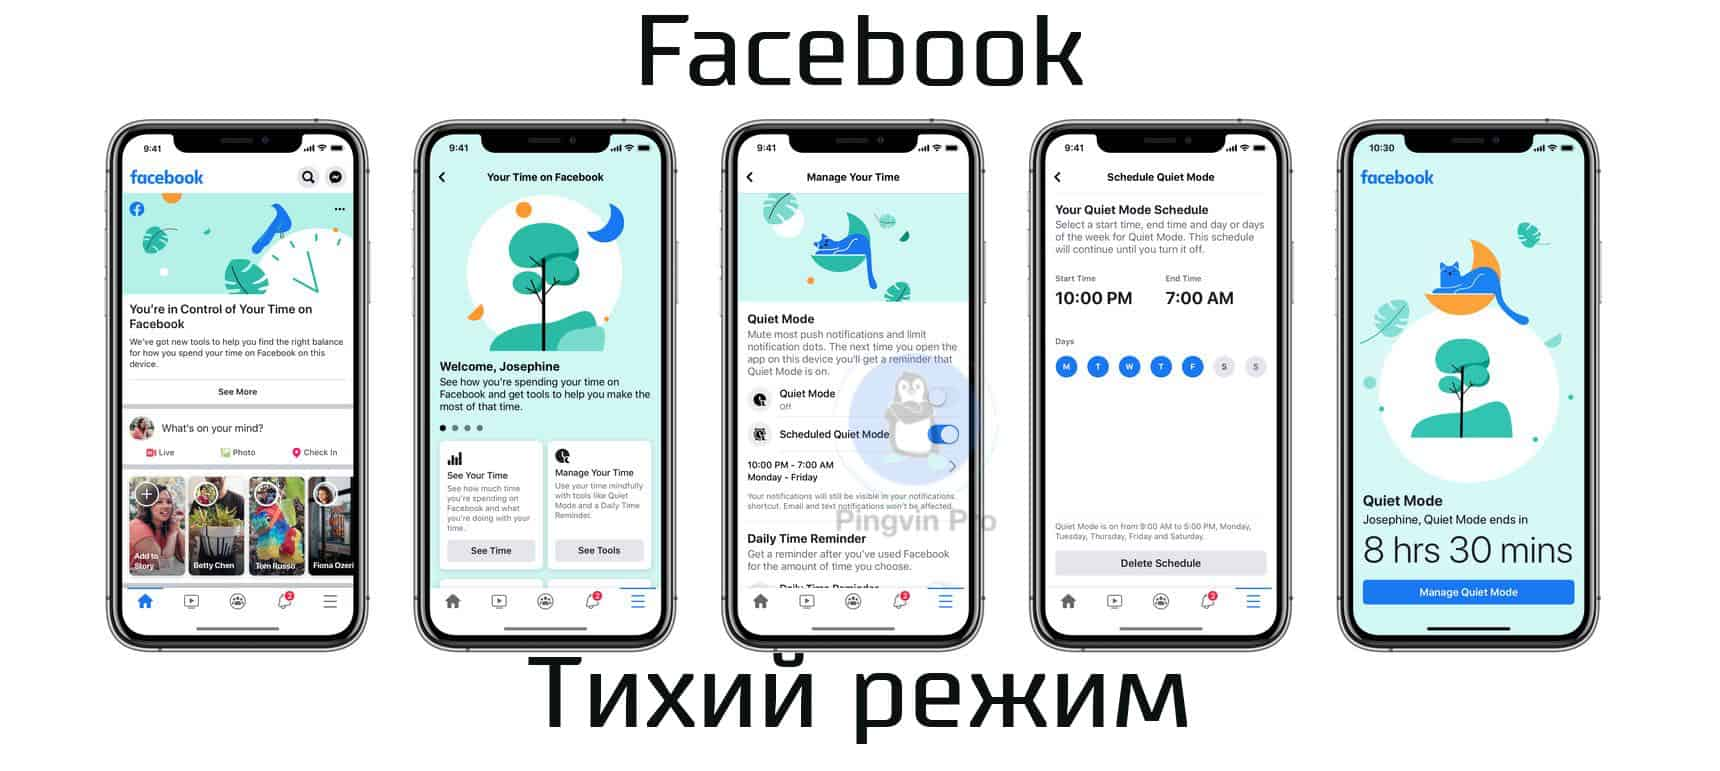 Facebook для iOS отримав «тихий режим»